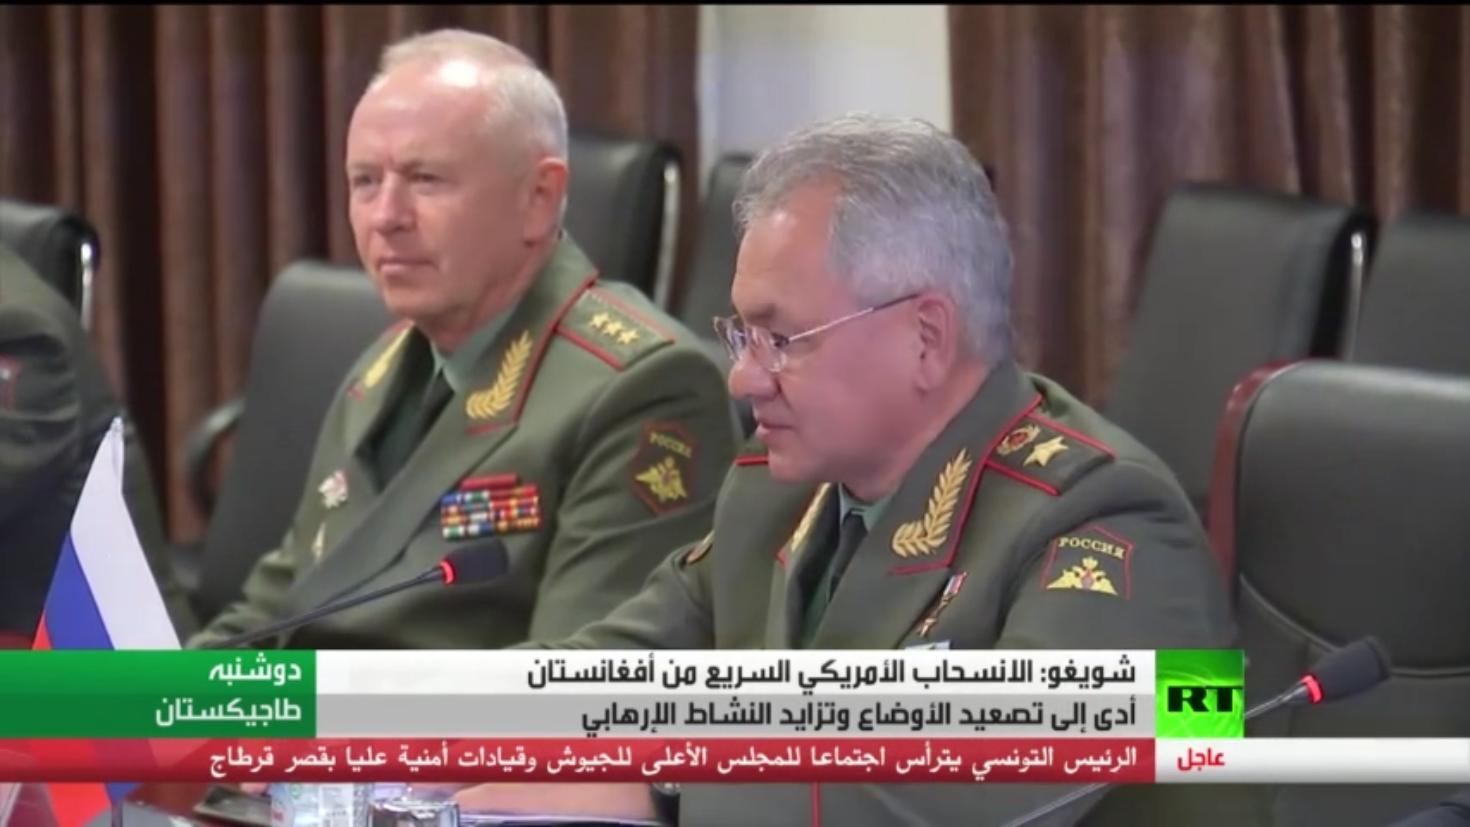 موسكو: انسحاب واشنطن عزز الإرهاب بأفغانستان